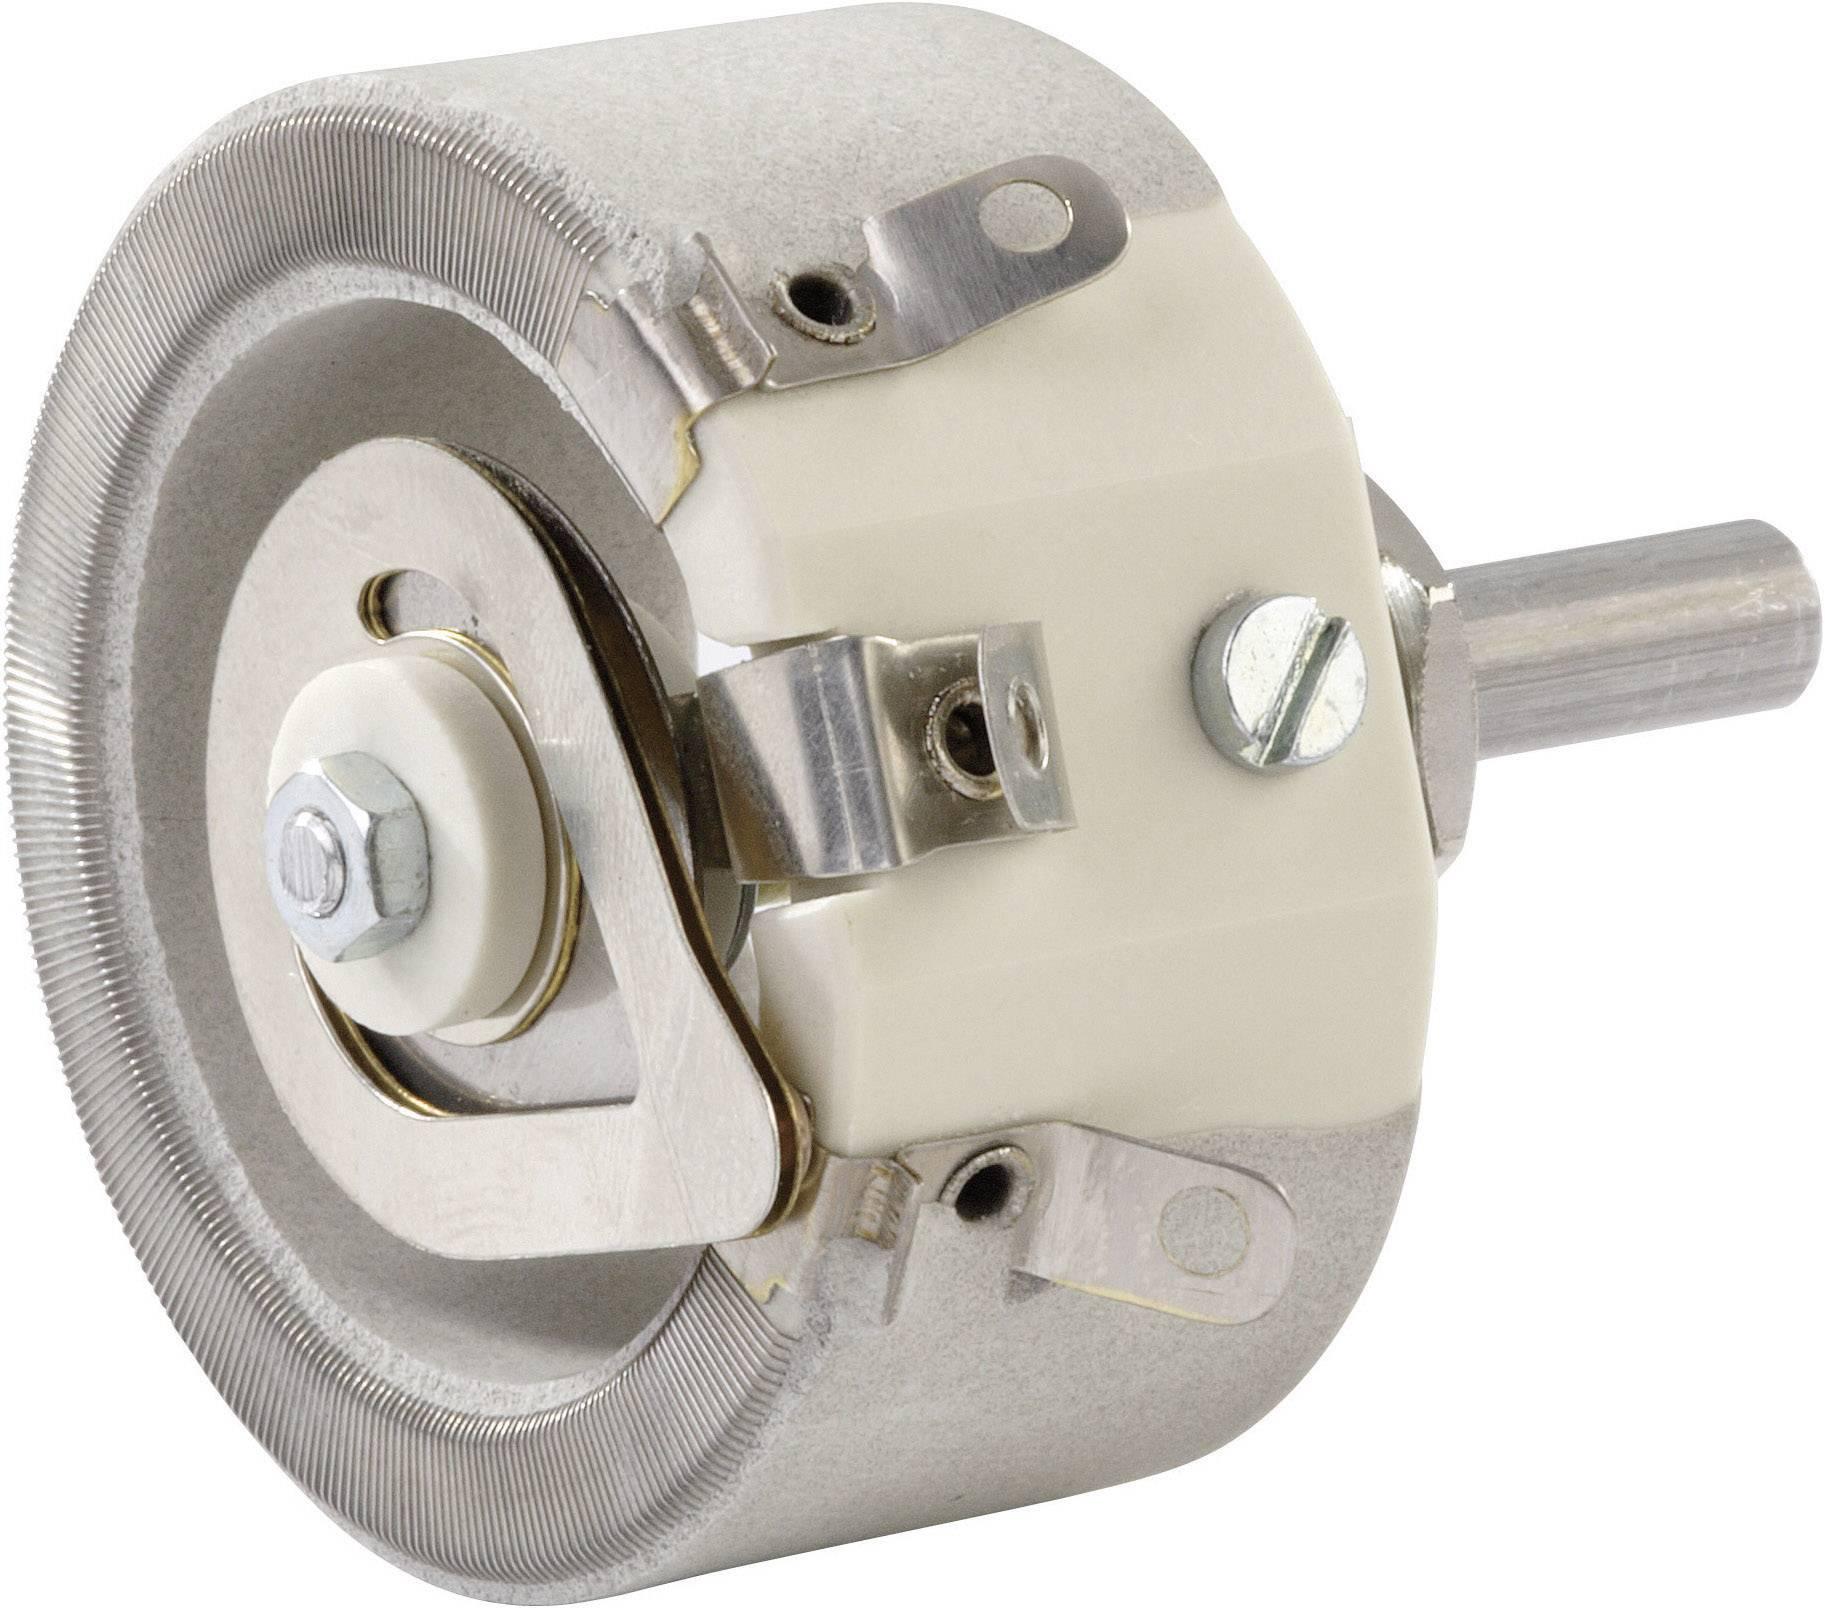 Drôtový potenciometer mono TT Electronics AB 3191001700 3191001700, 10 W, 22 Ohm, 1 ks